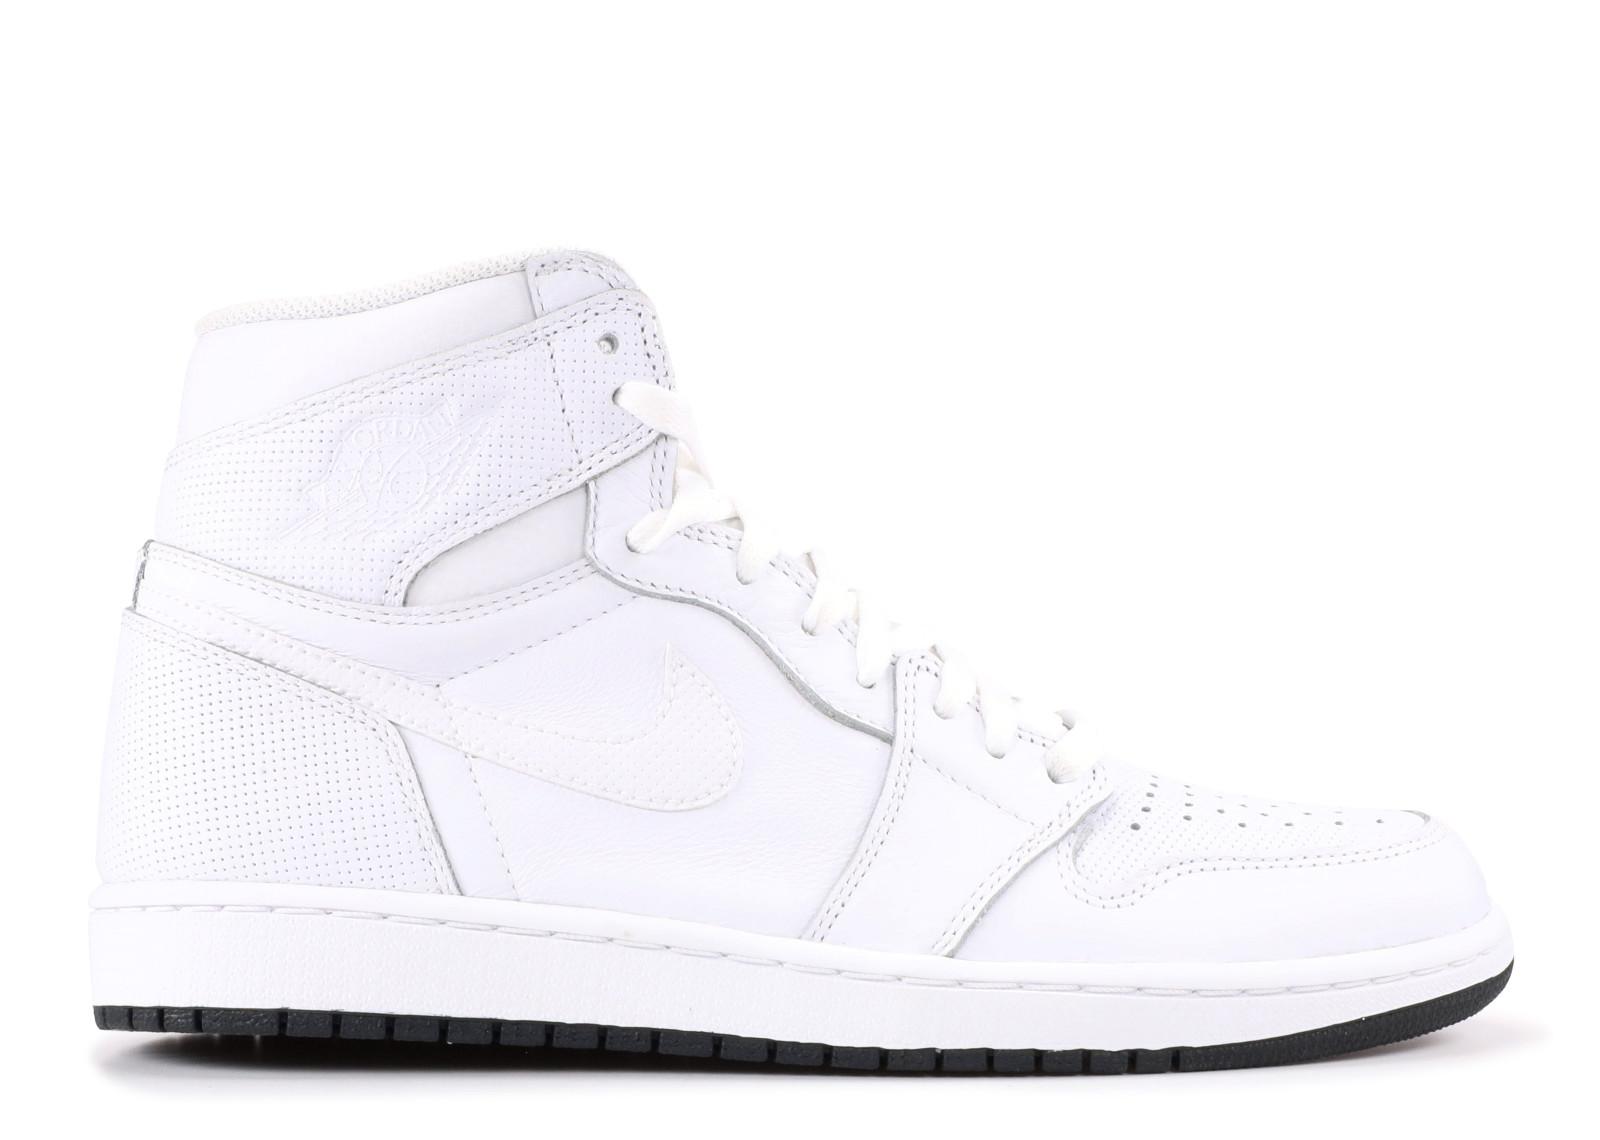 pretty nice fd878 d5e7e Nike Air Jordan 1 Retro High Men s Shoes OEM, Men s Fashion, Footwear,  Sneakers on Carousell